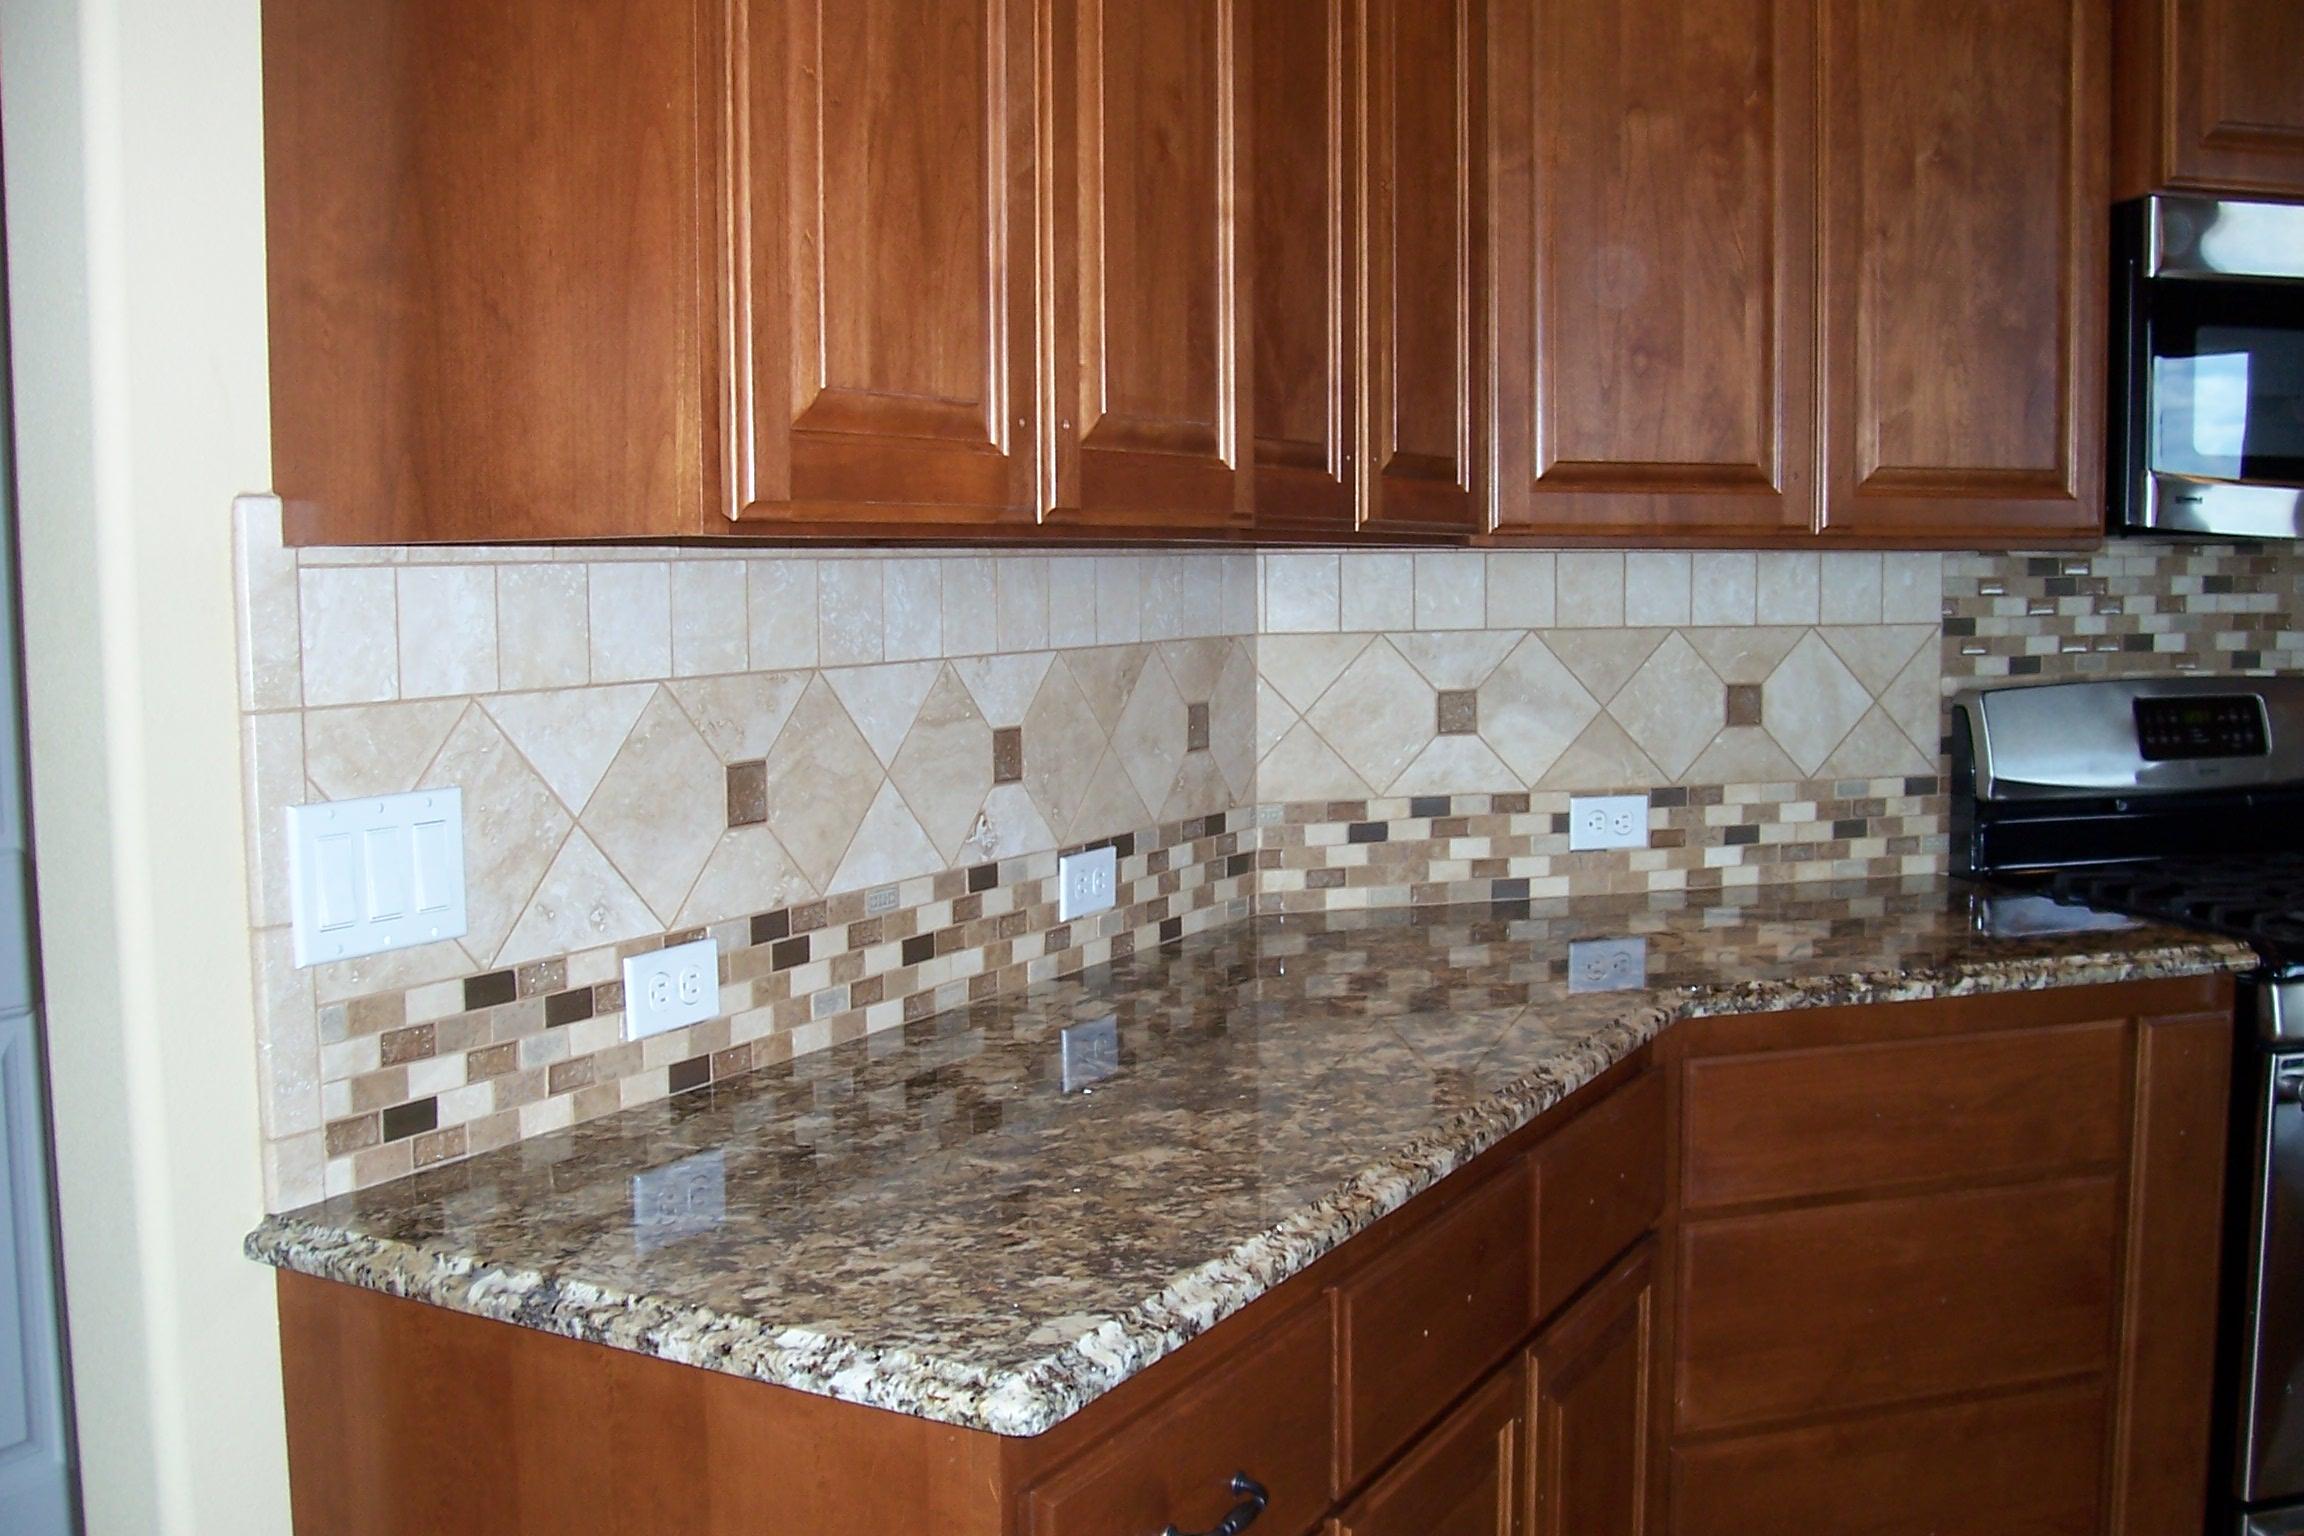 kitchen backsplash design ideas kitchen tile designs kitchen clear white laminated kitchen backsplash ideas design